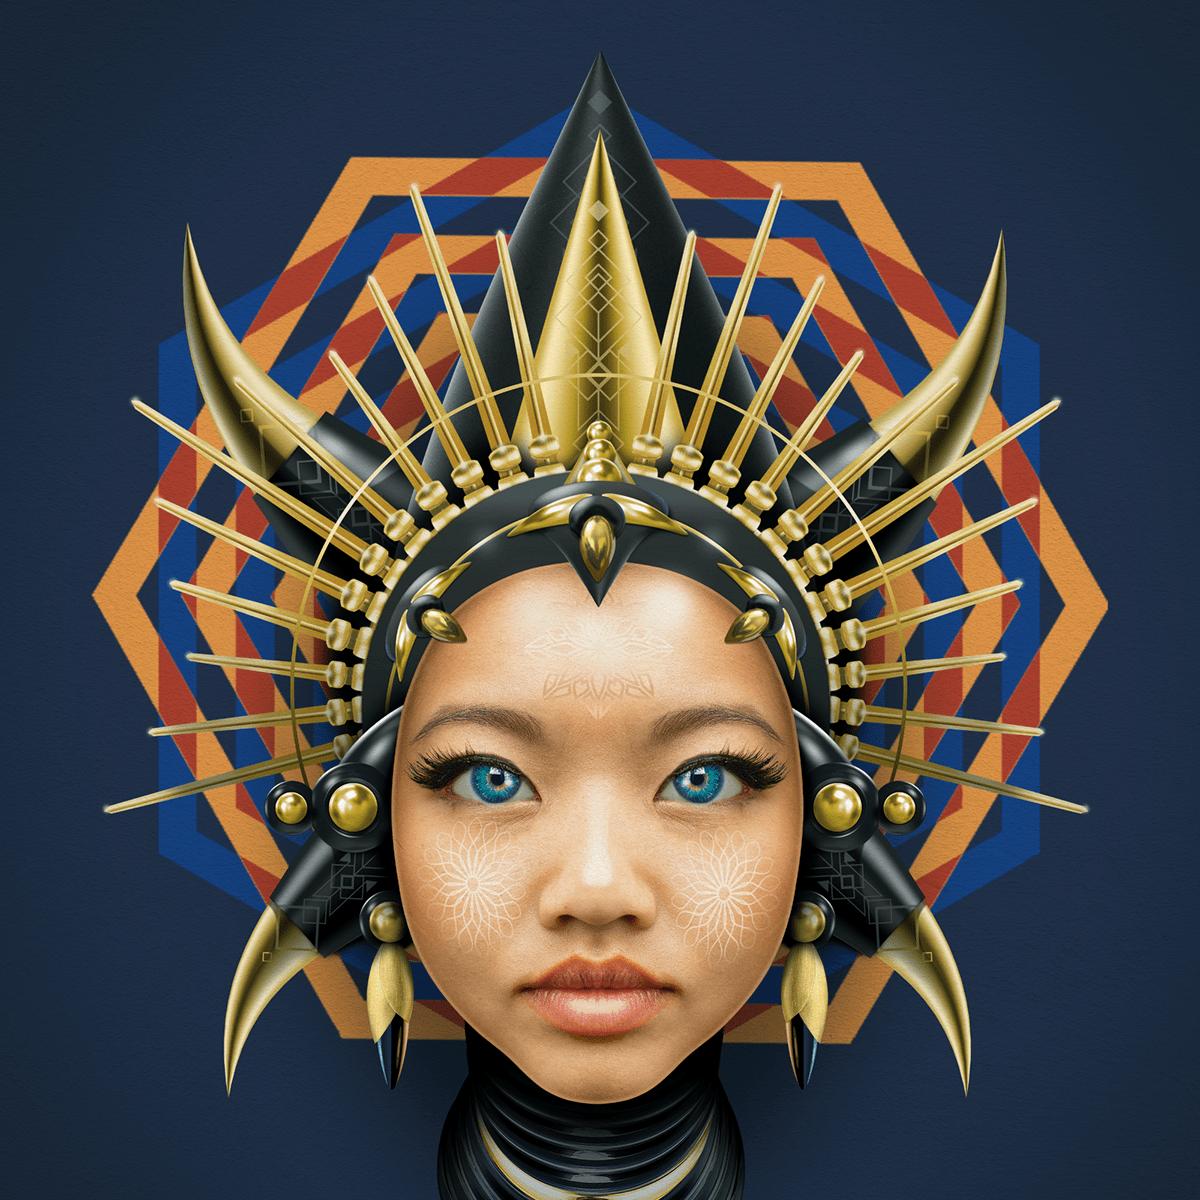 art artwork Character design  cryptoart digital Digital Art  Drawing  nft portrait vector